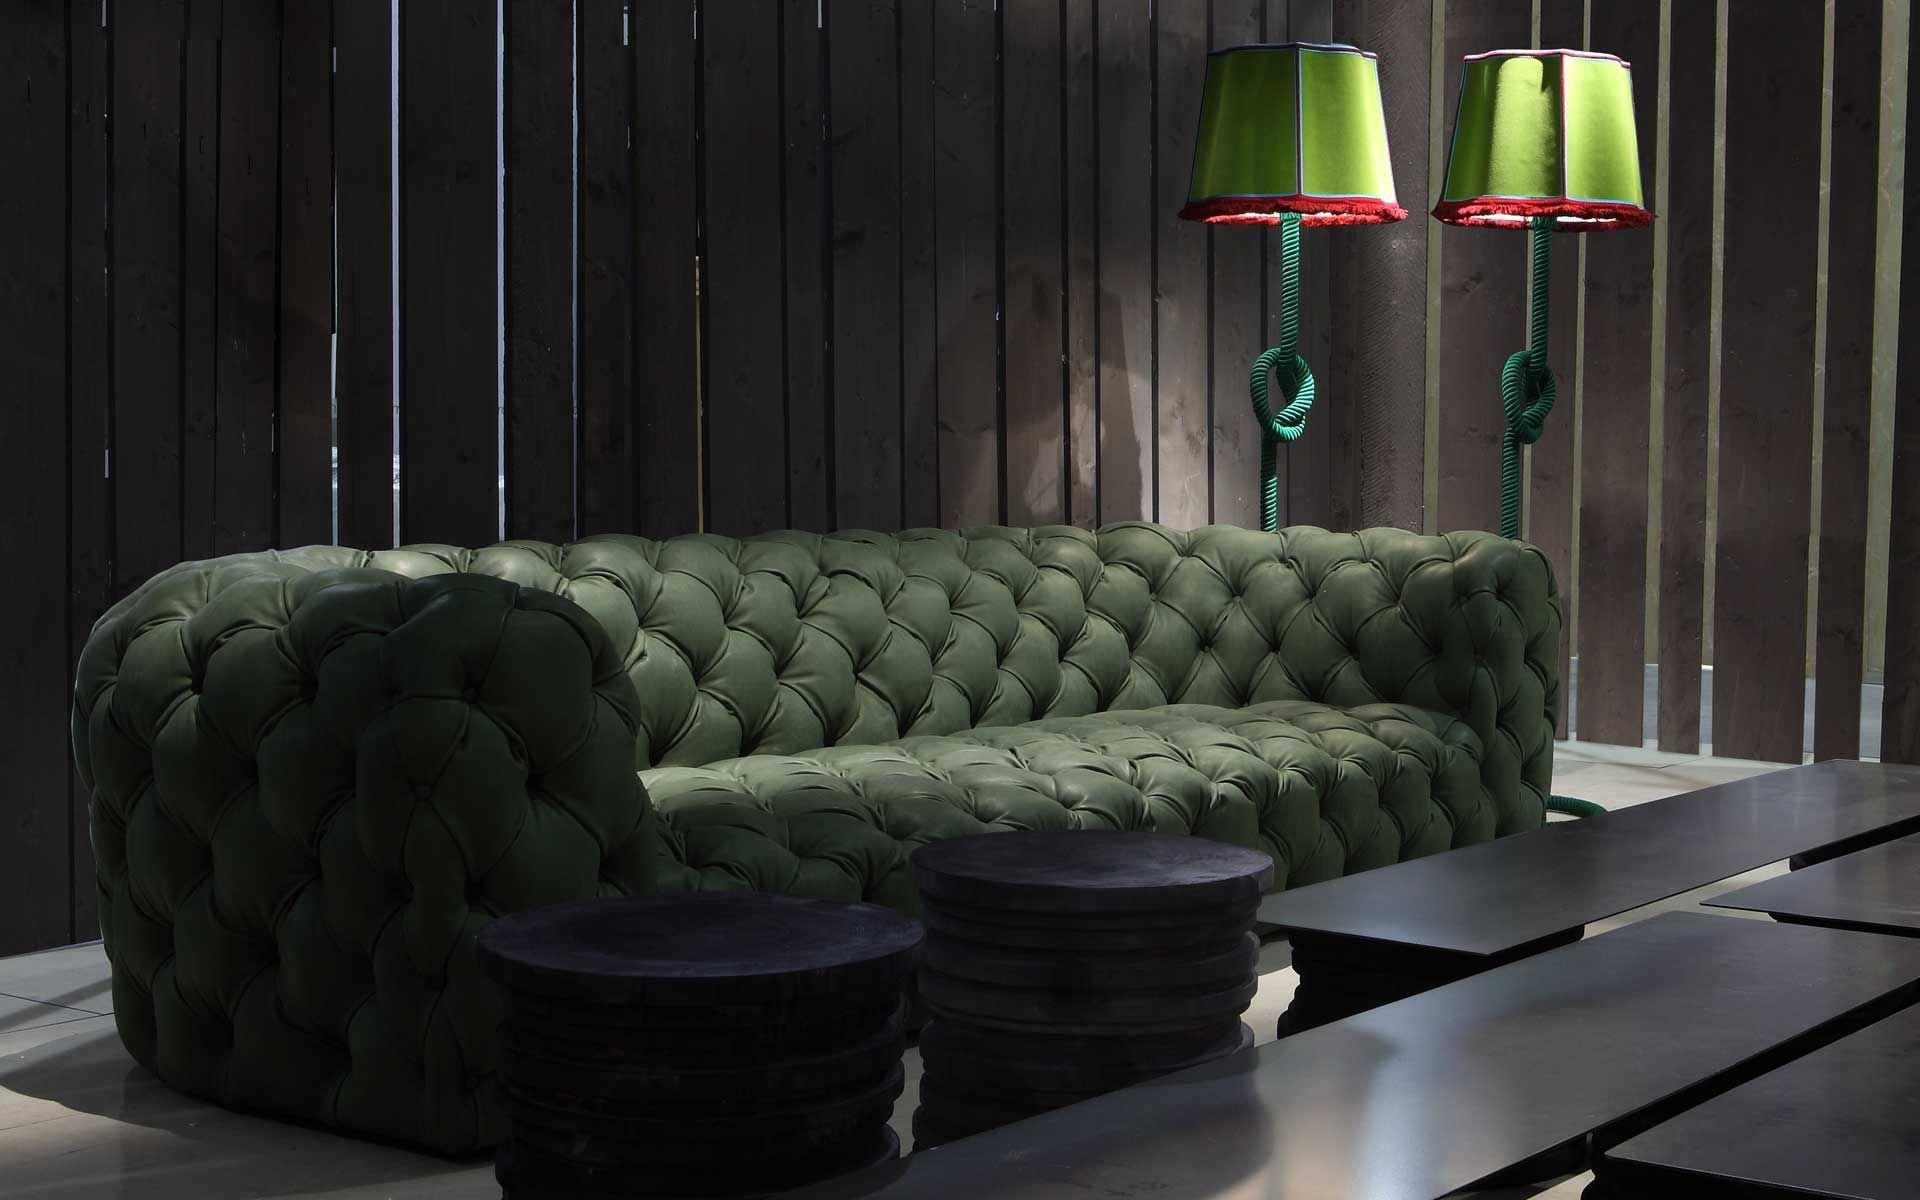 Modern Chesterfield Sofa — Liberty Interior : Classic Chesterfield For Tufted Leather Chesterfield Sofas (Image 15 of 20)